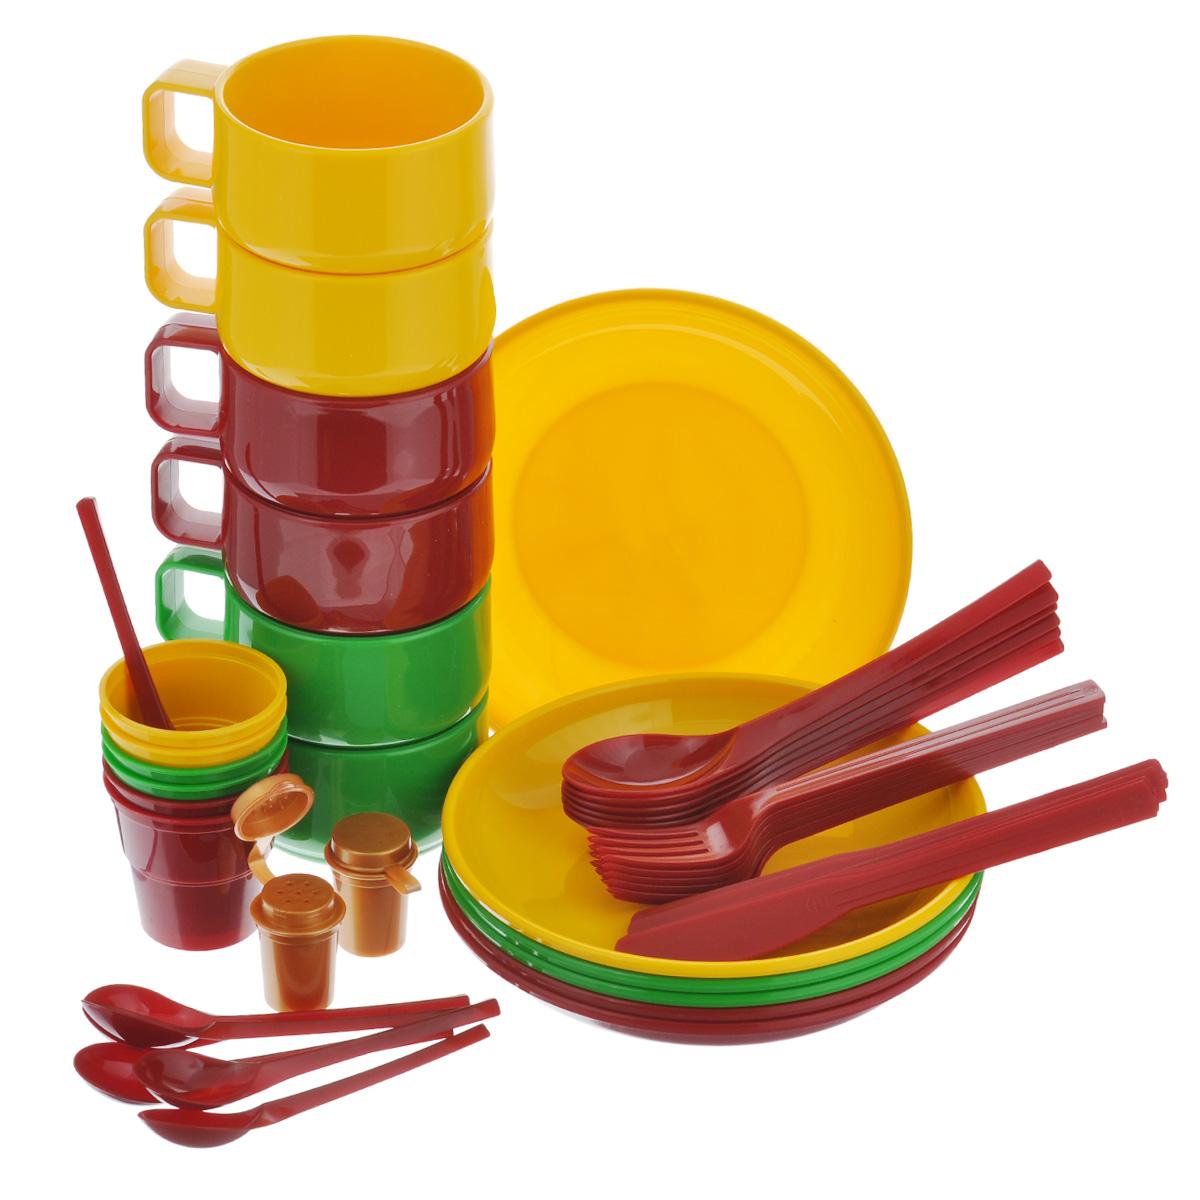 Набор посуды Solaris, на 6 персон